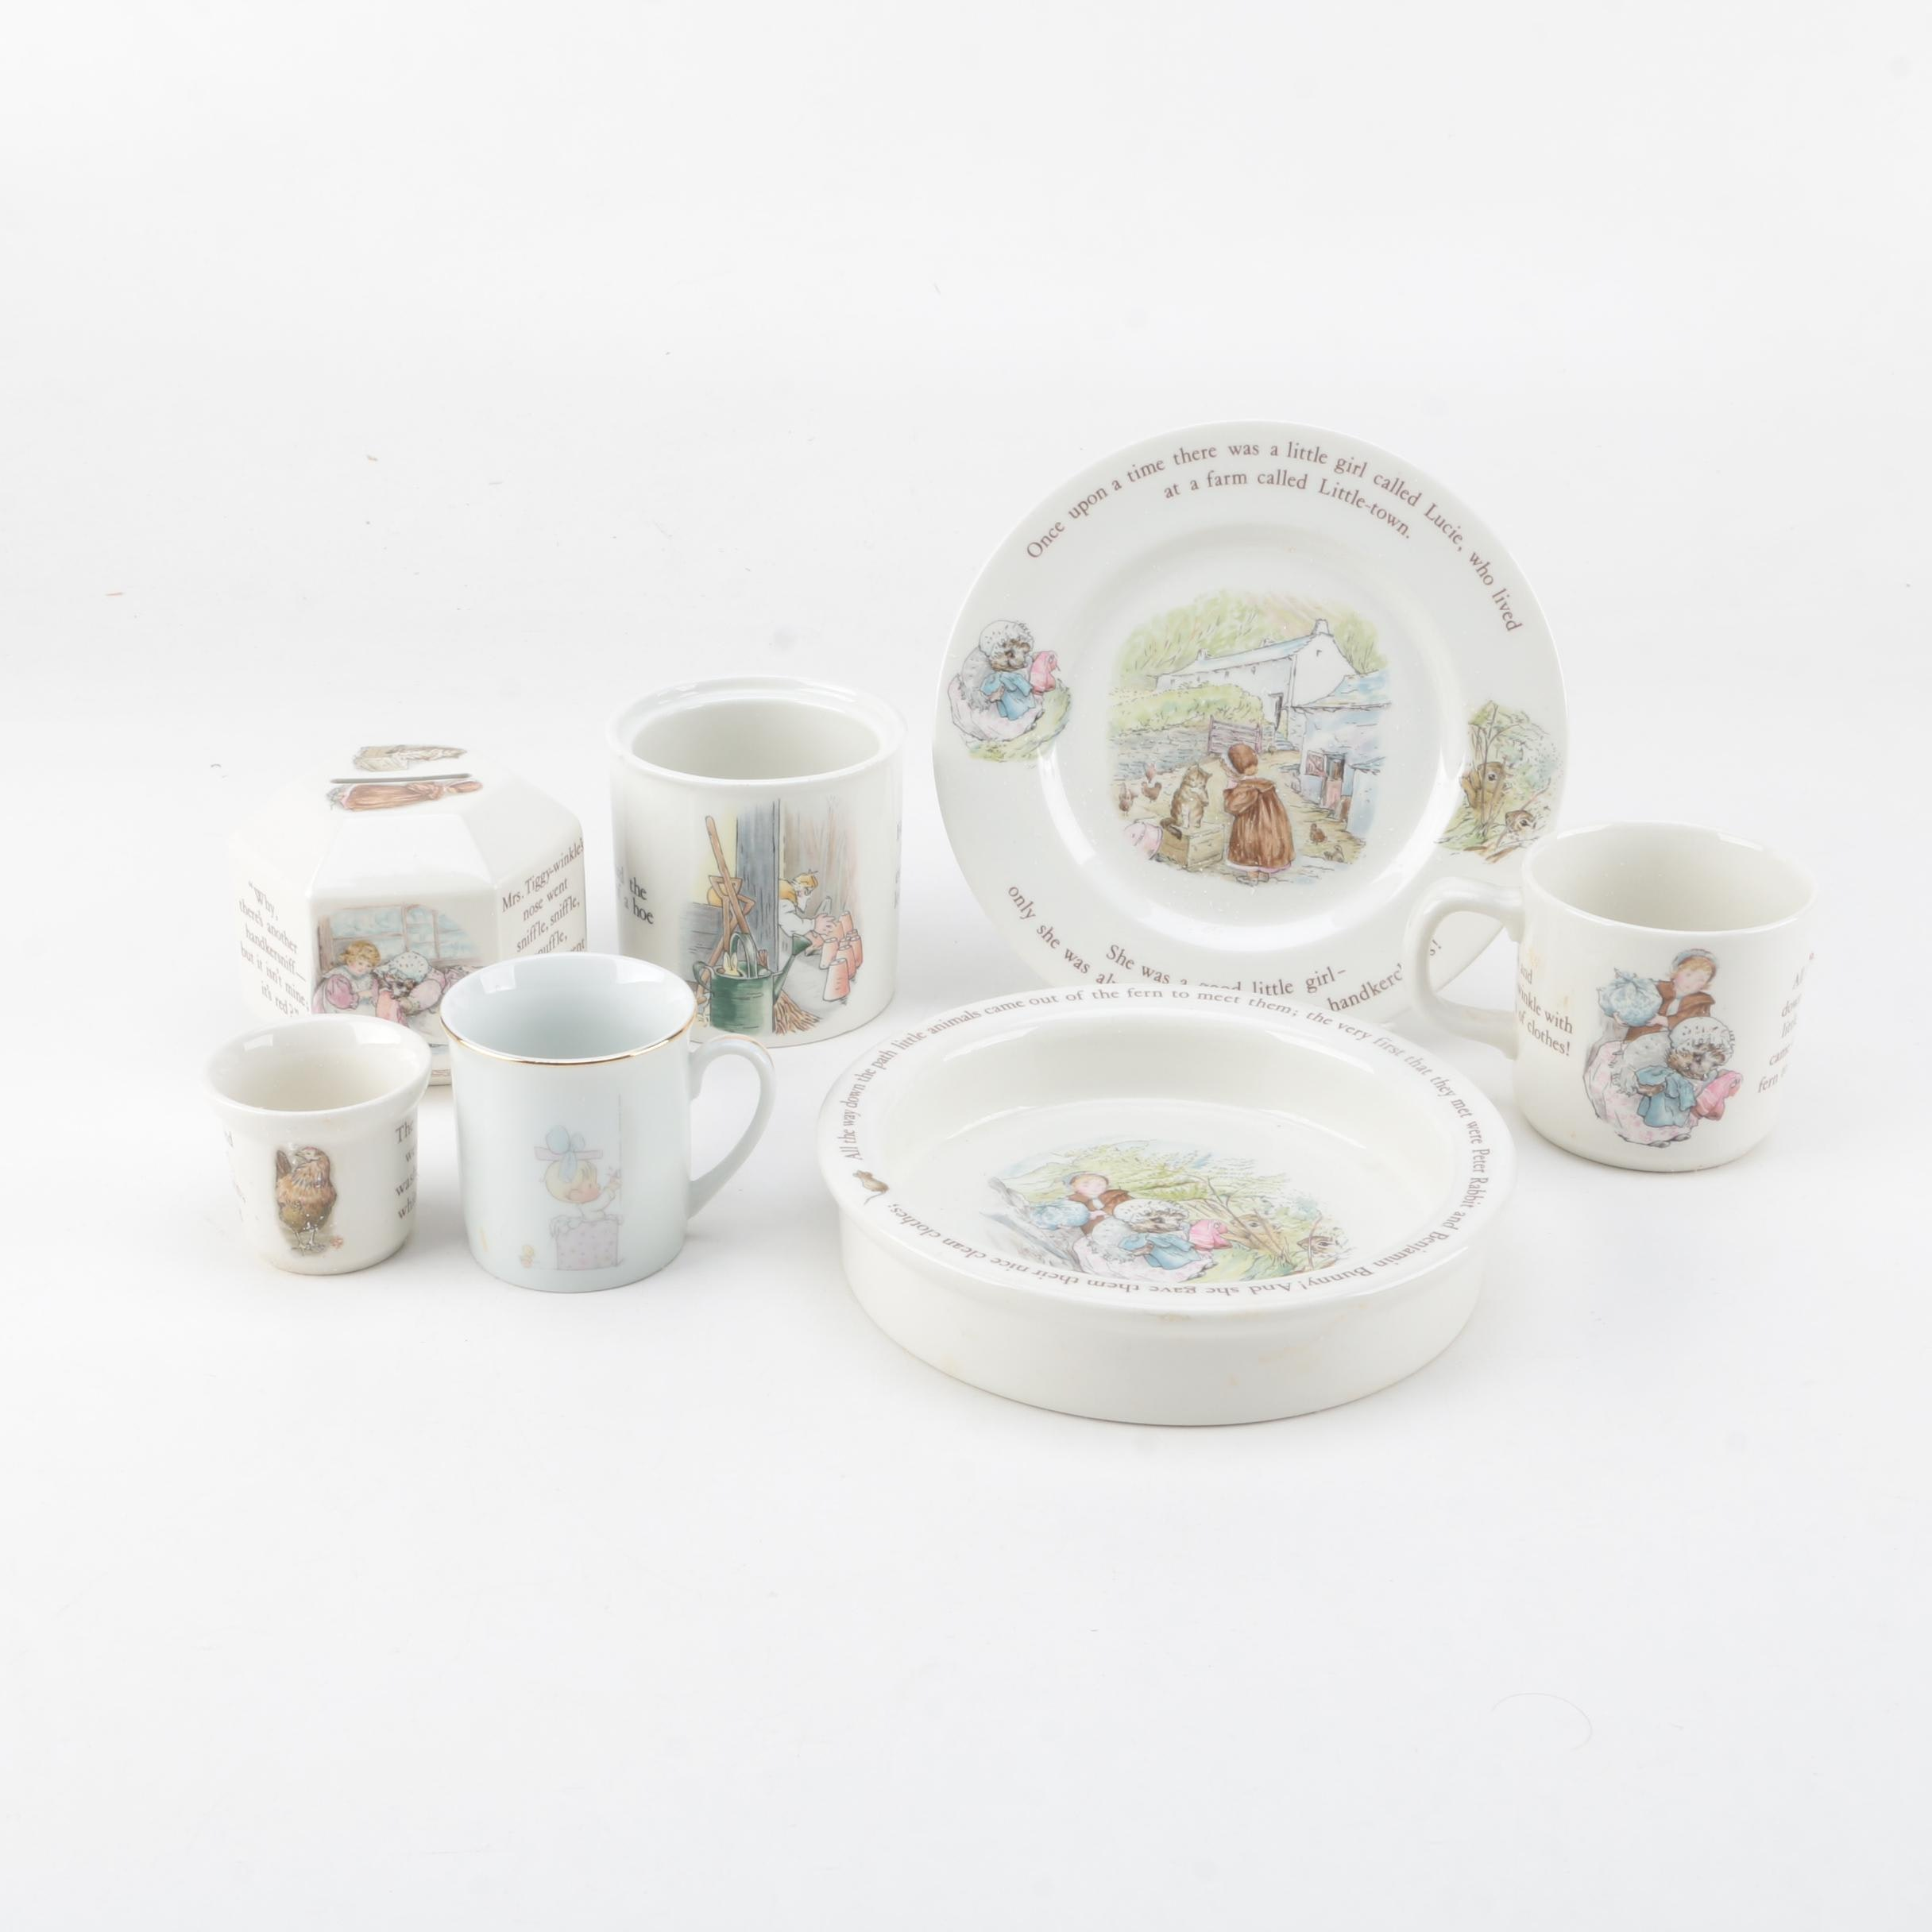 Wedgwood Beatrix Potter Porcelain Tableware